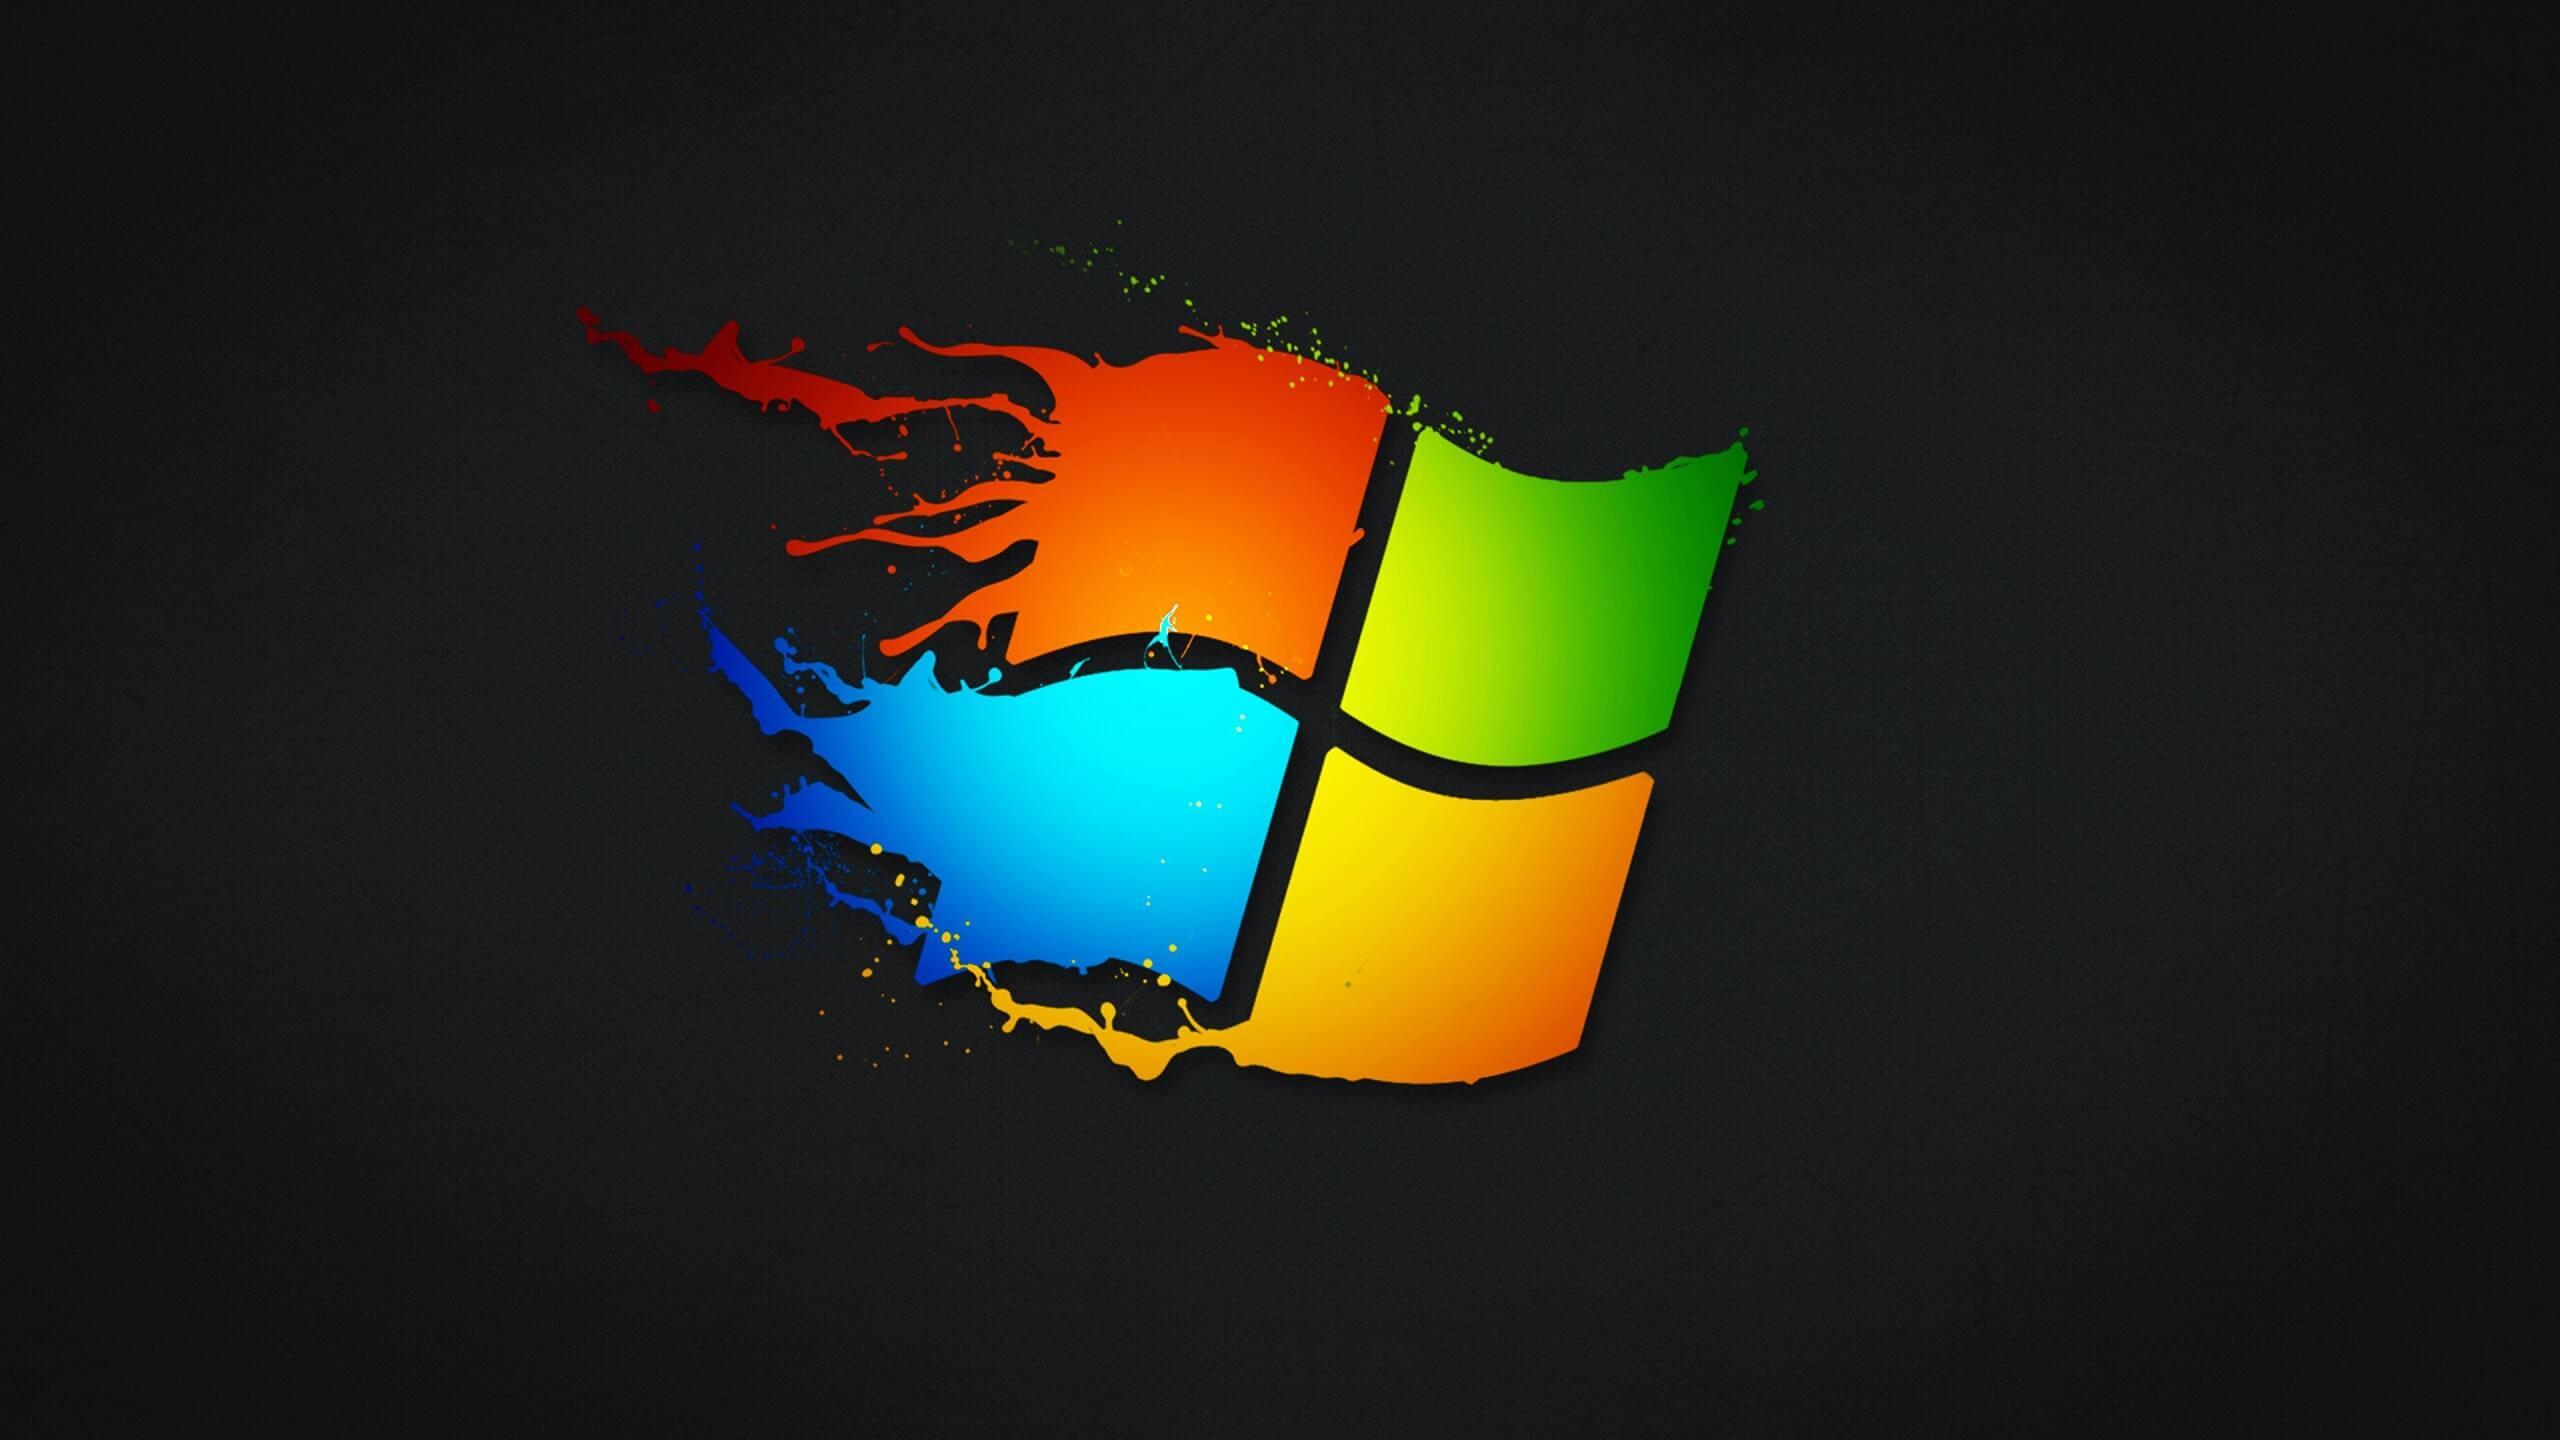 2K windows wallpaper background